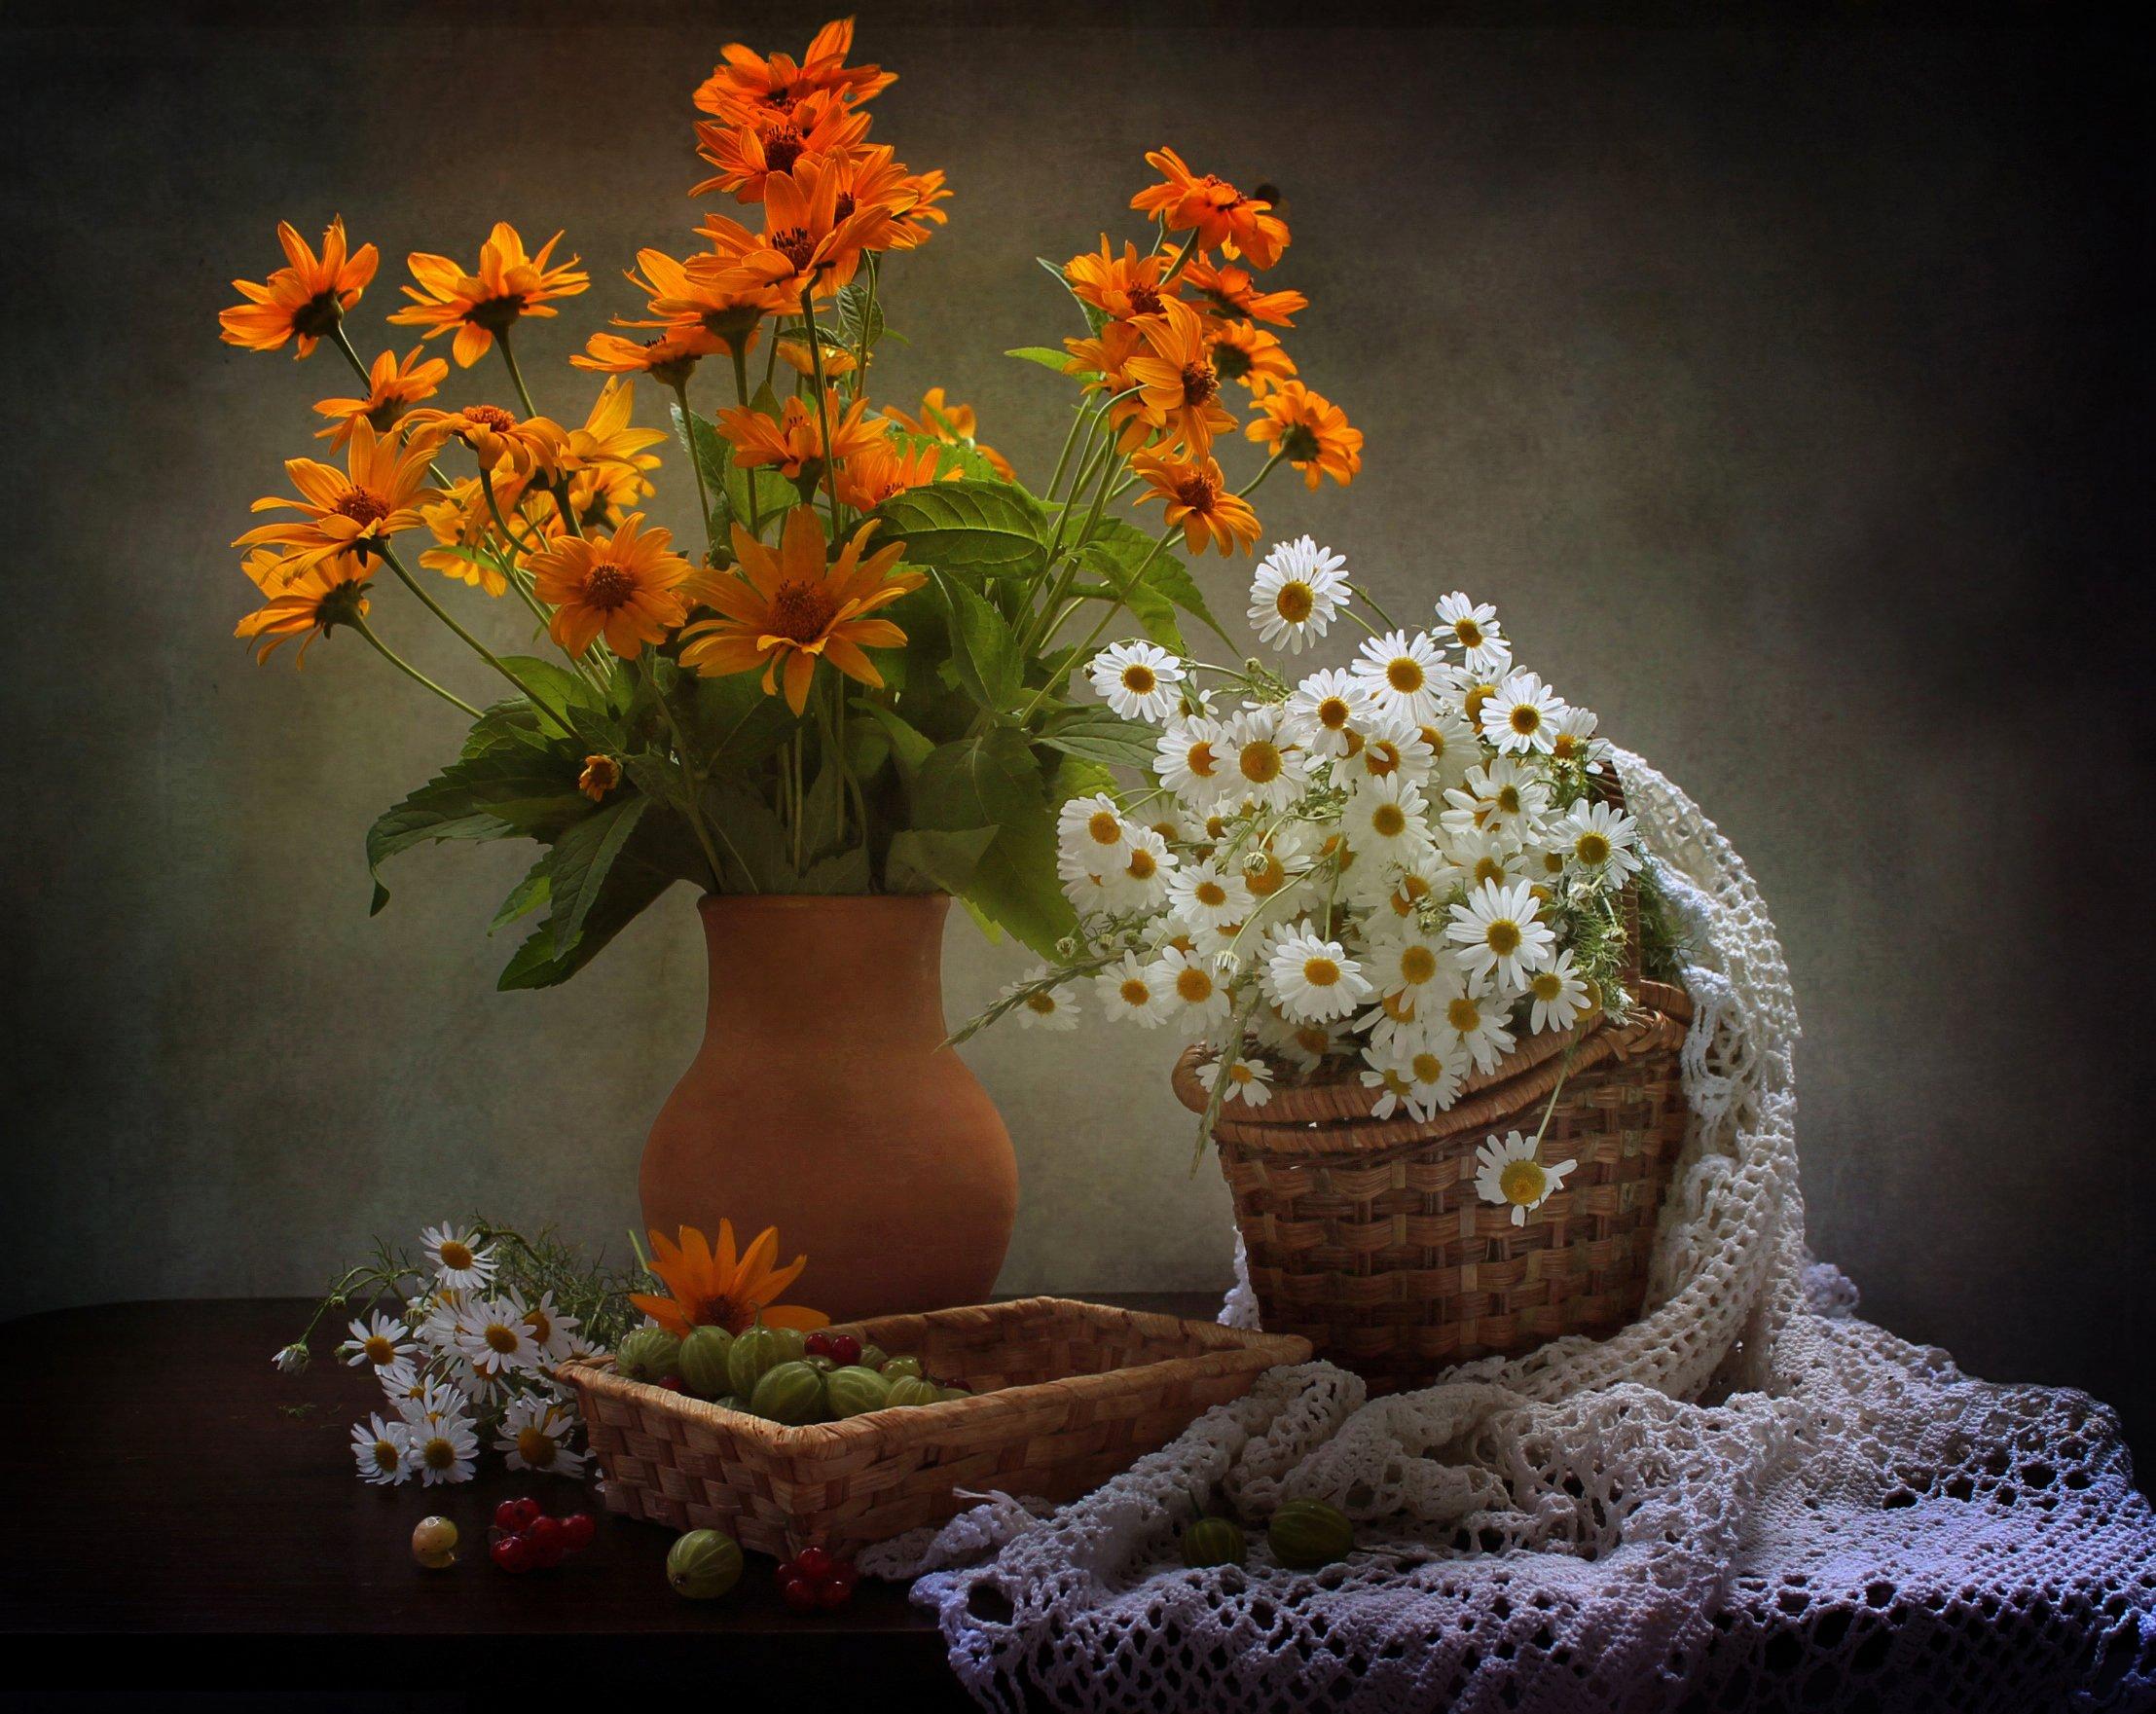 натюрморт, лето, цветы, ромашки, Ковалева Светлана